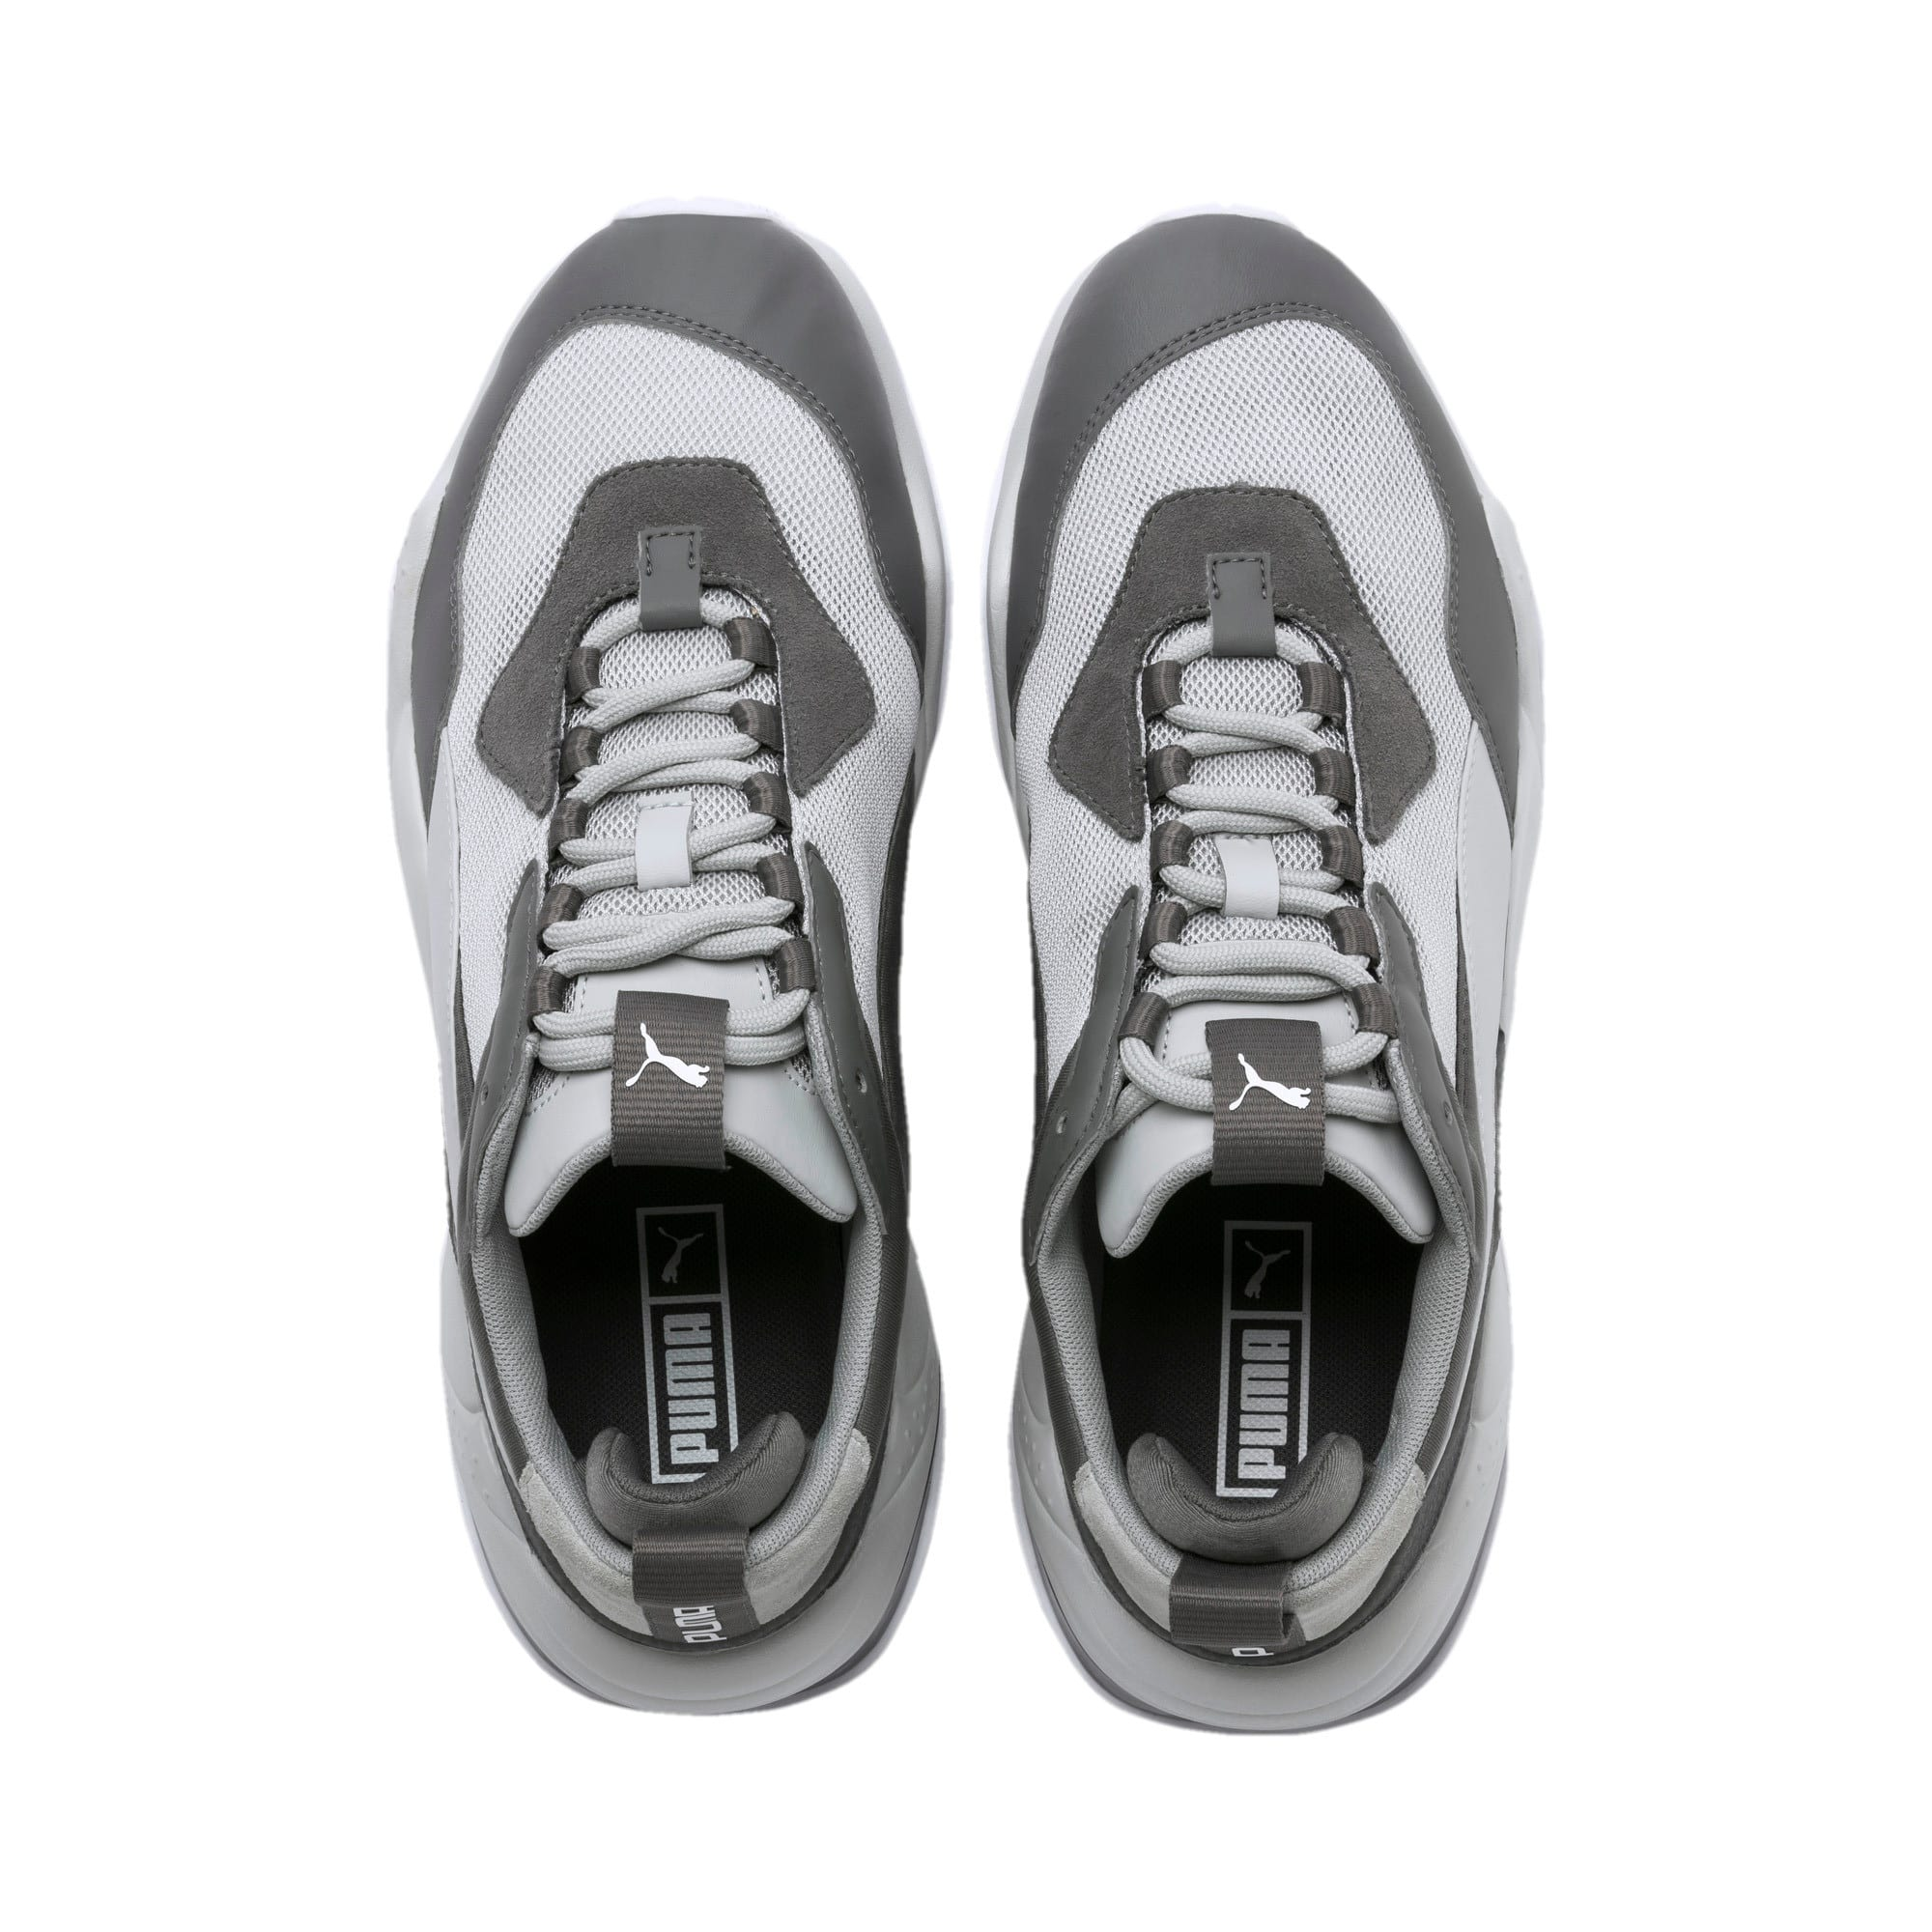 Thumbnail 7 of Thunder Fashion 2.0 Sneakers, High Rise-CASTLEROCK, medium